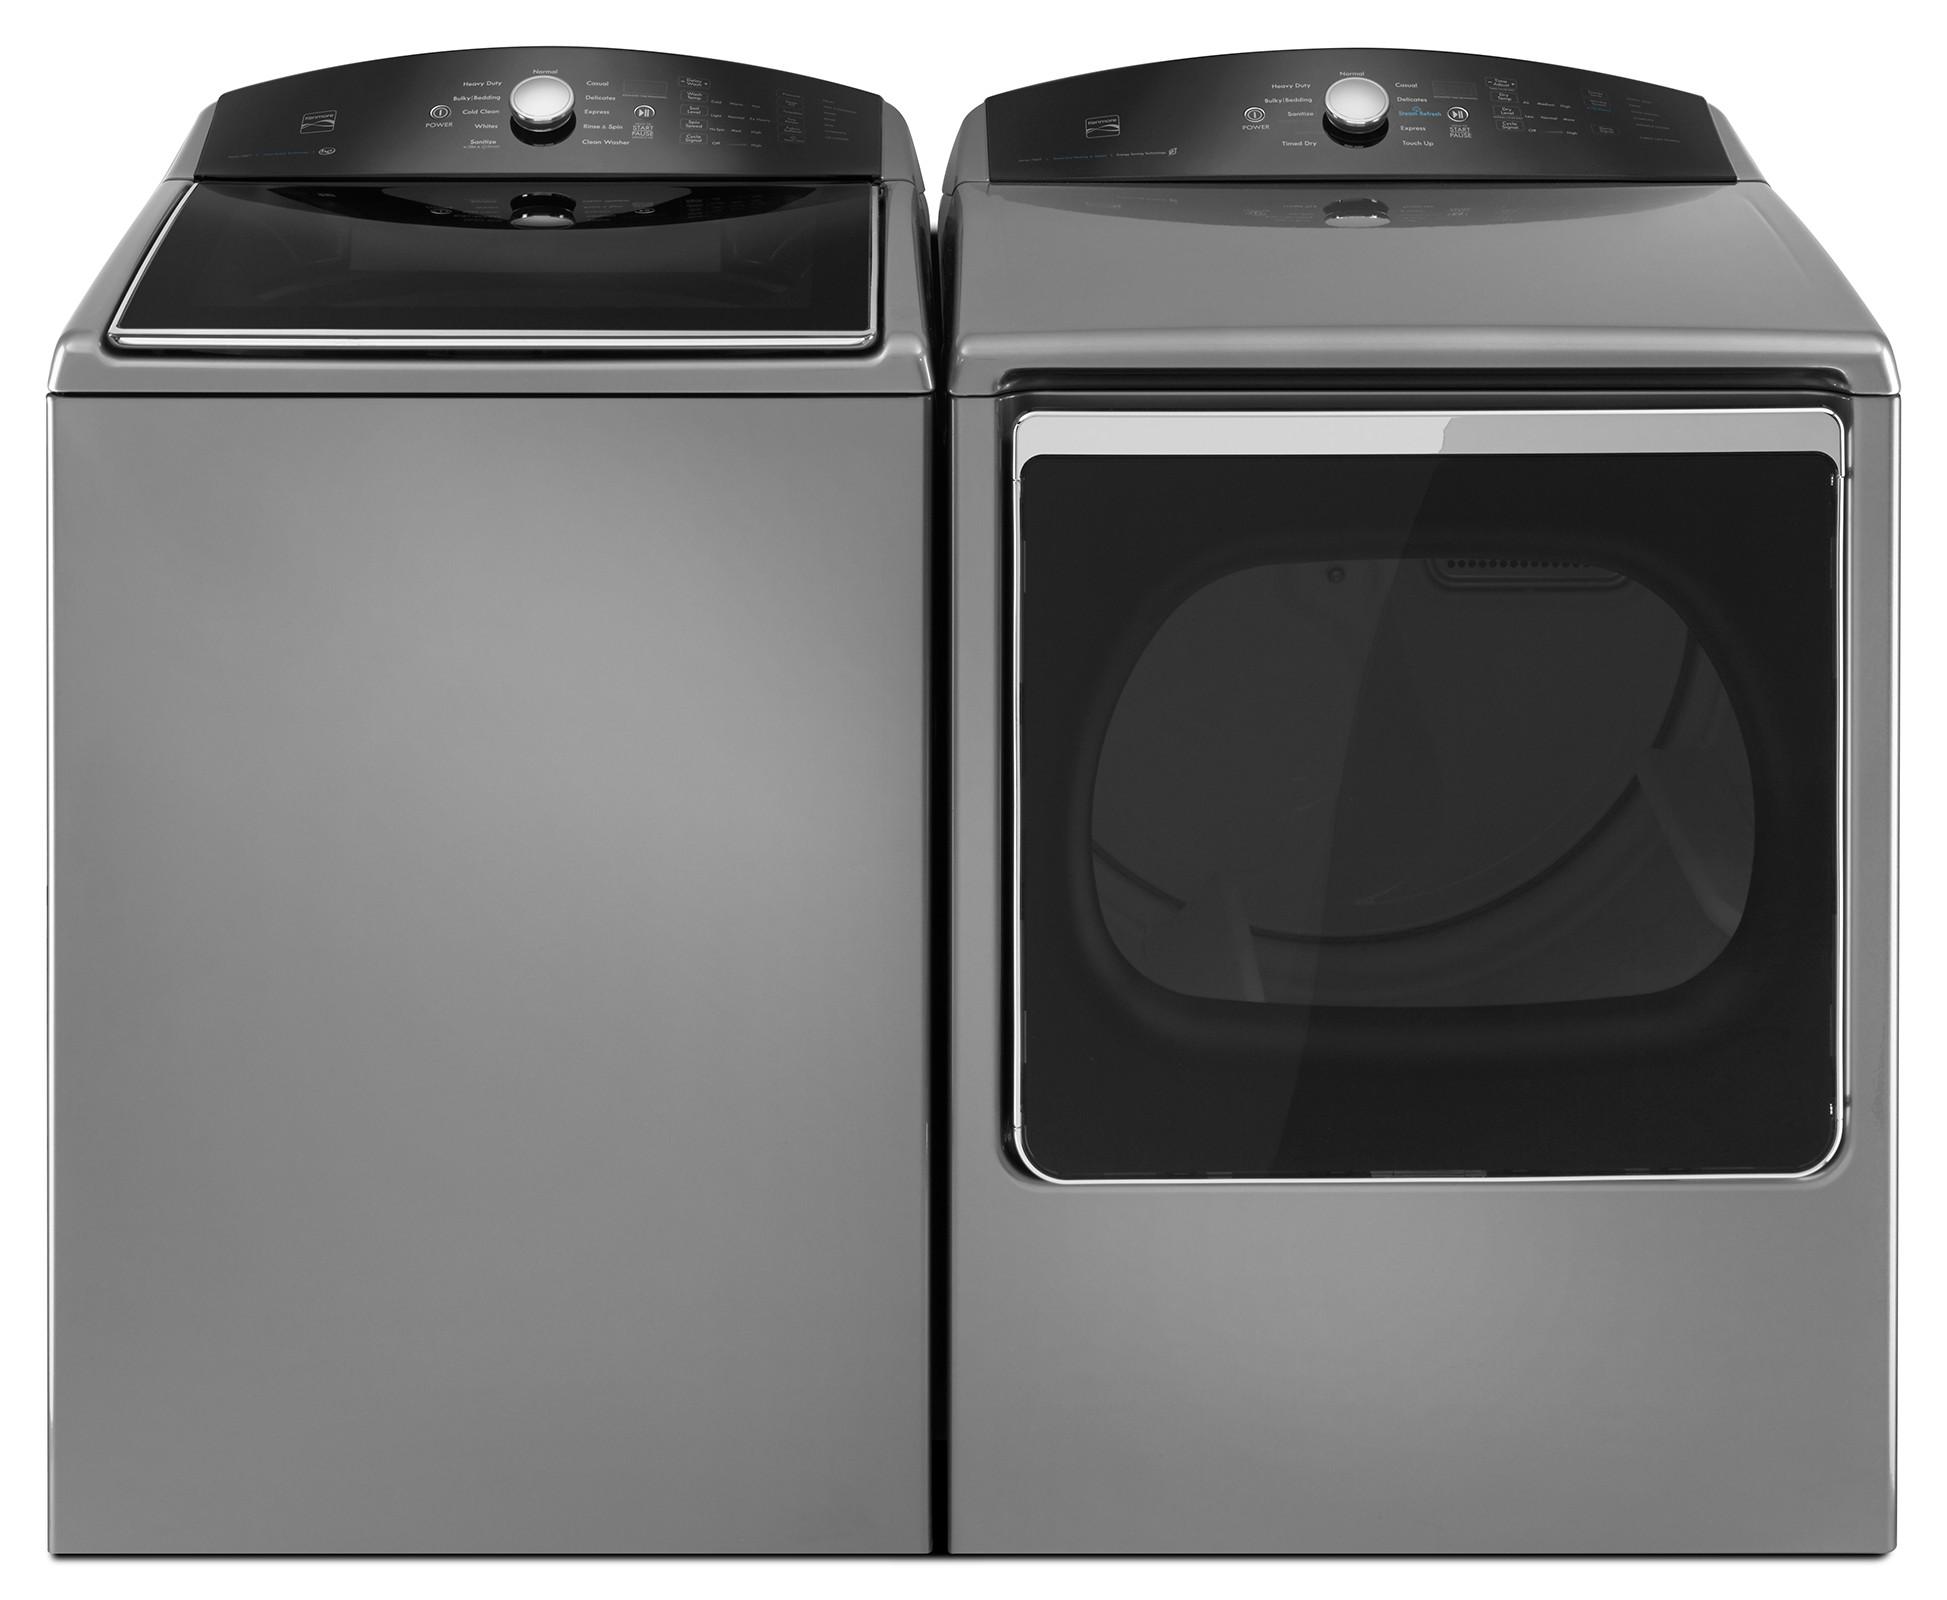 Kenmore 69133 8.8 cu. ft. Electric Dryer w/ Steam Refresh - Metallic